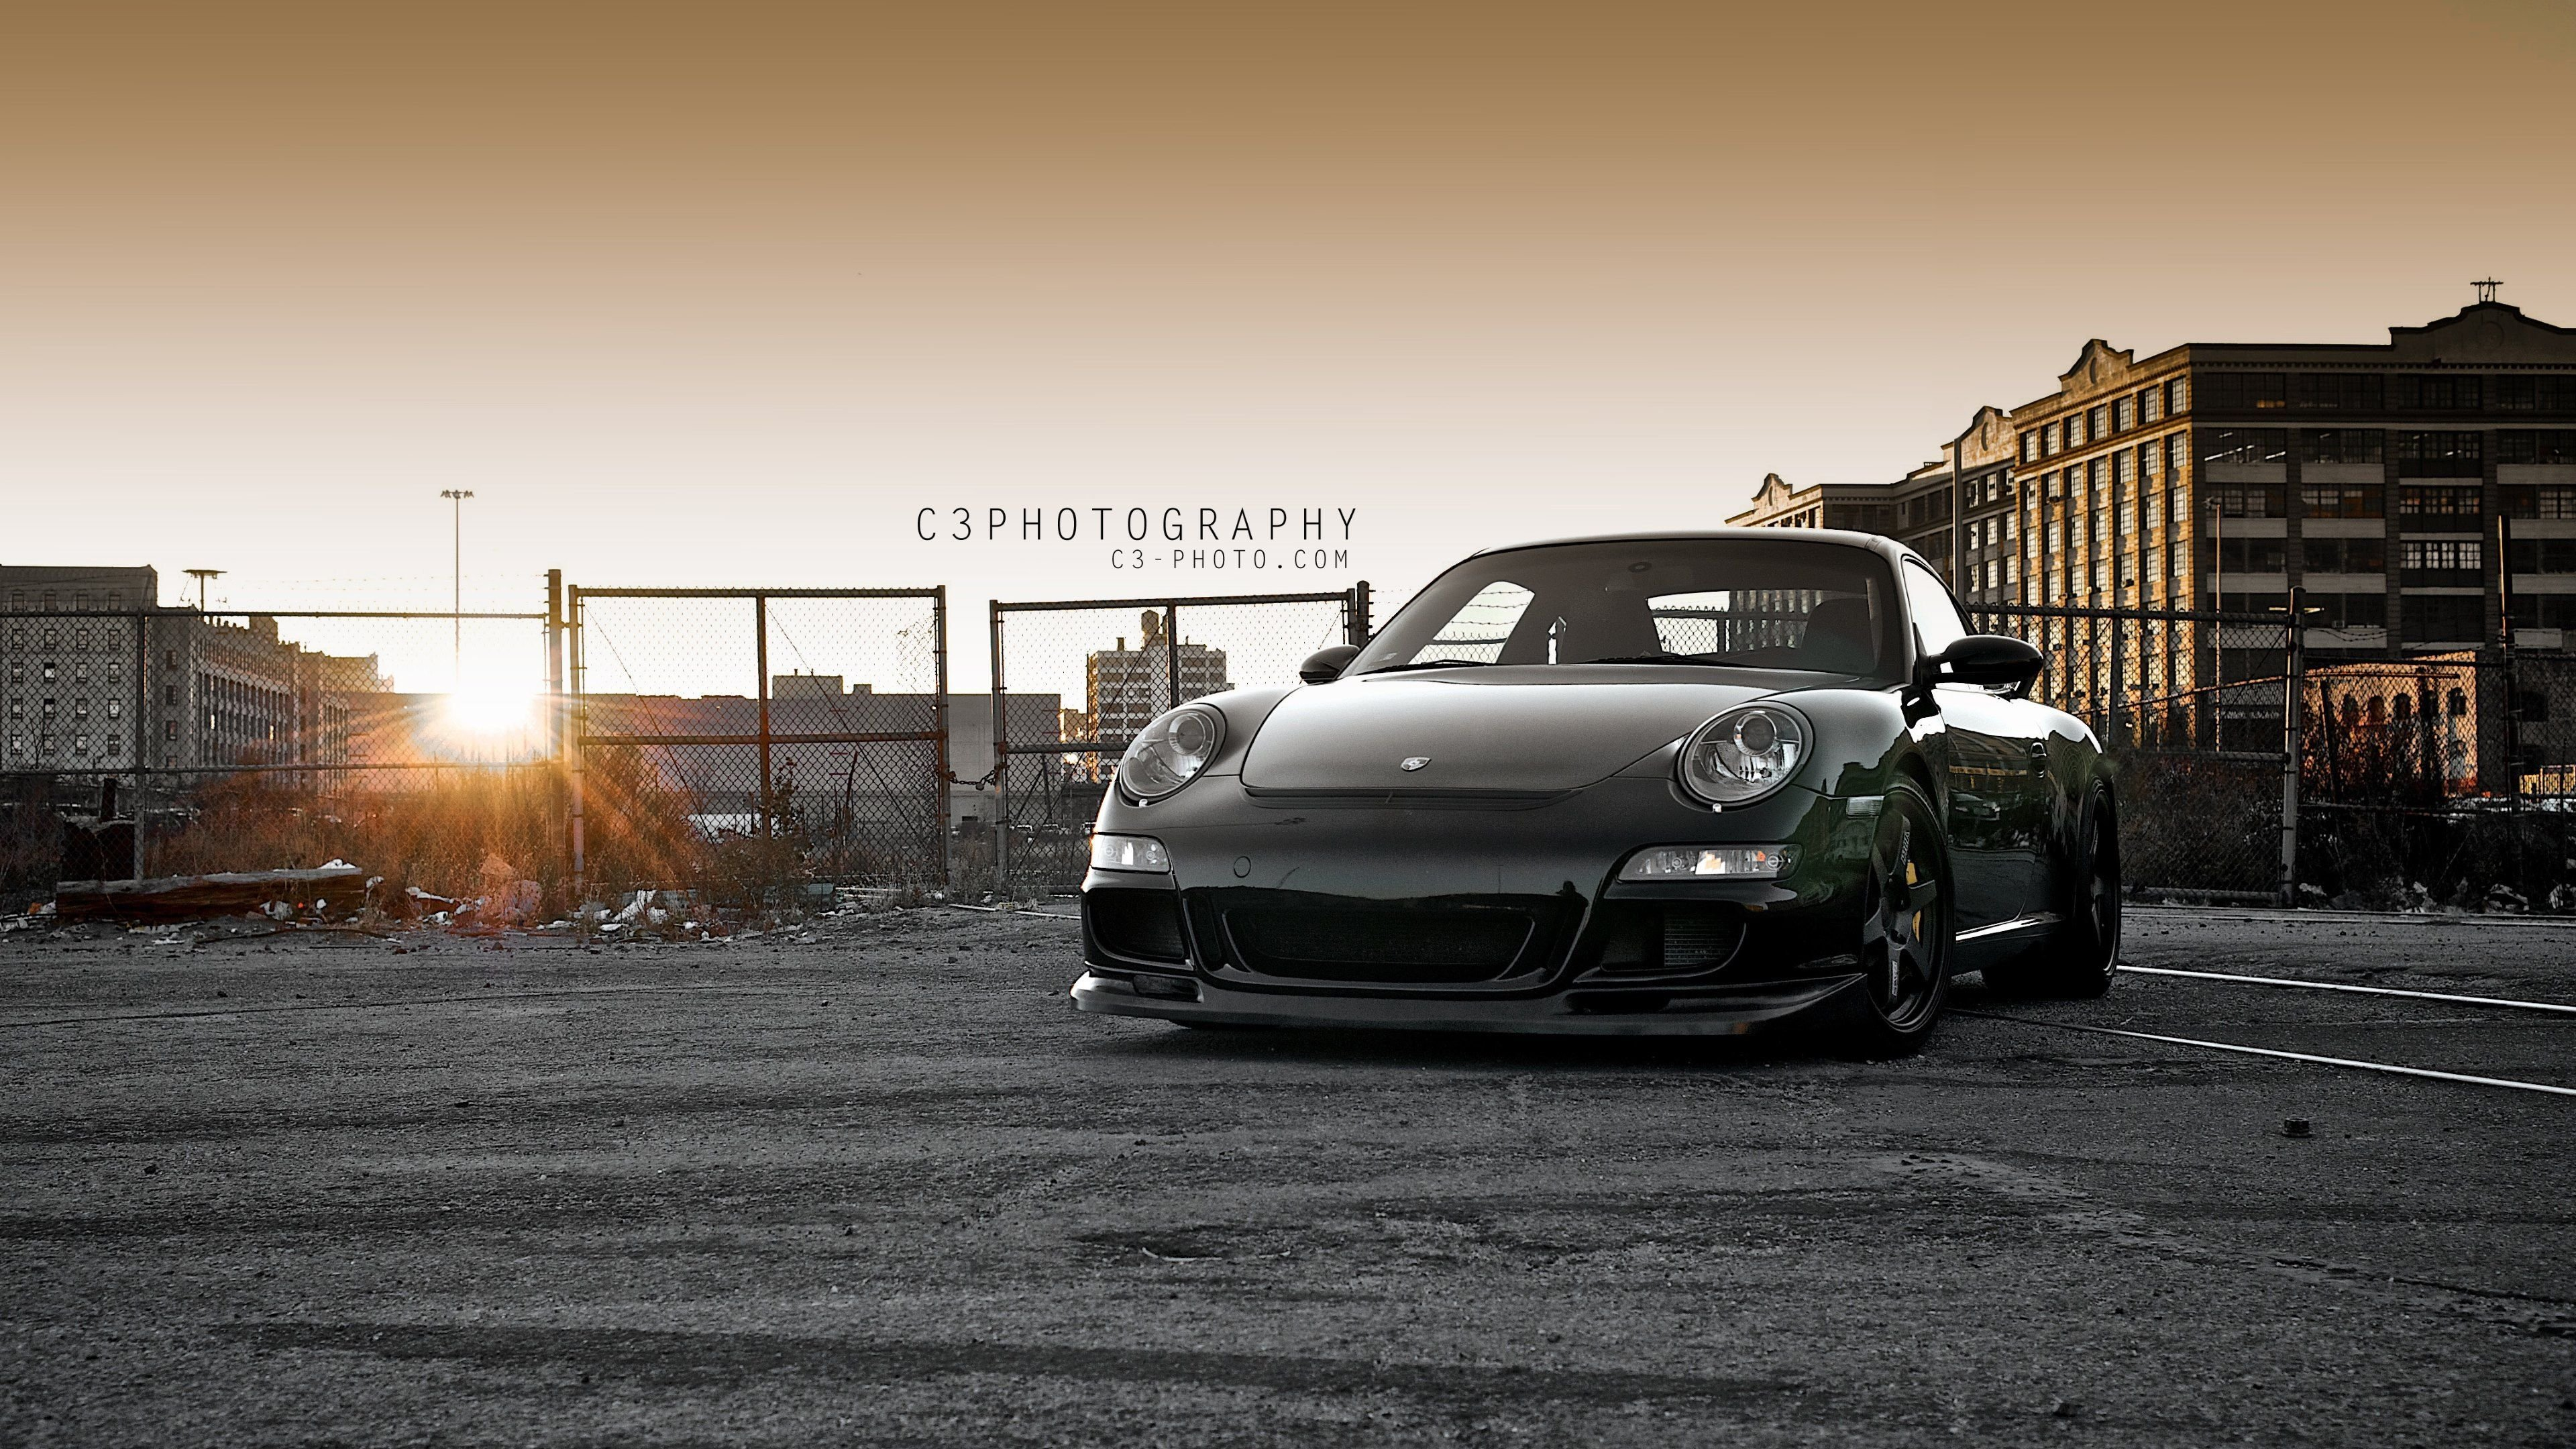 4K Ultra HD Porsche Wallpapers - Top Free 4K Ultra HD ...